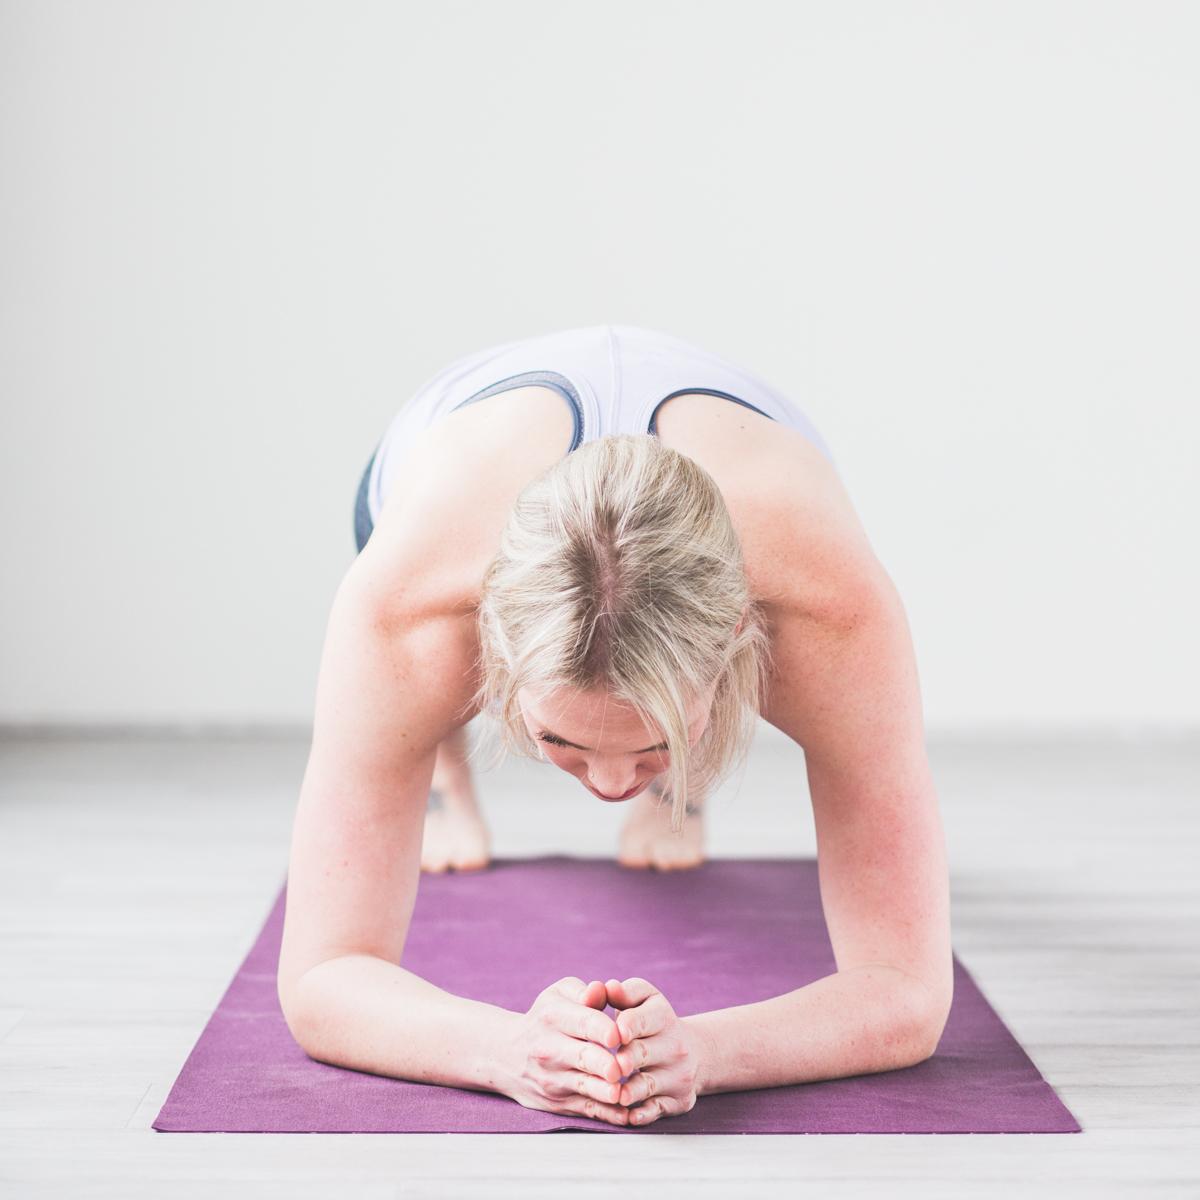 modern_fitness_woman-196.jpg